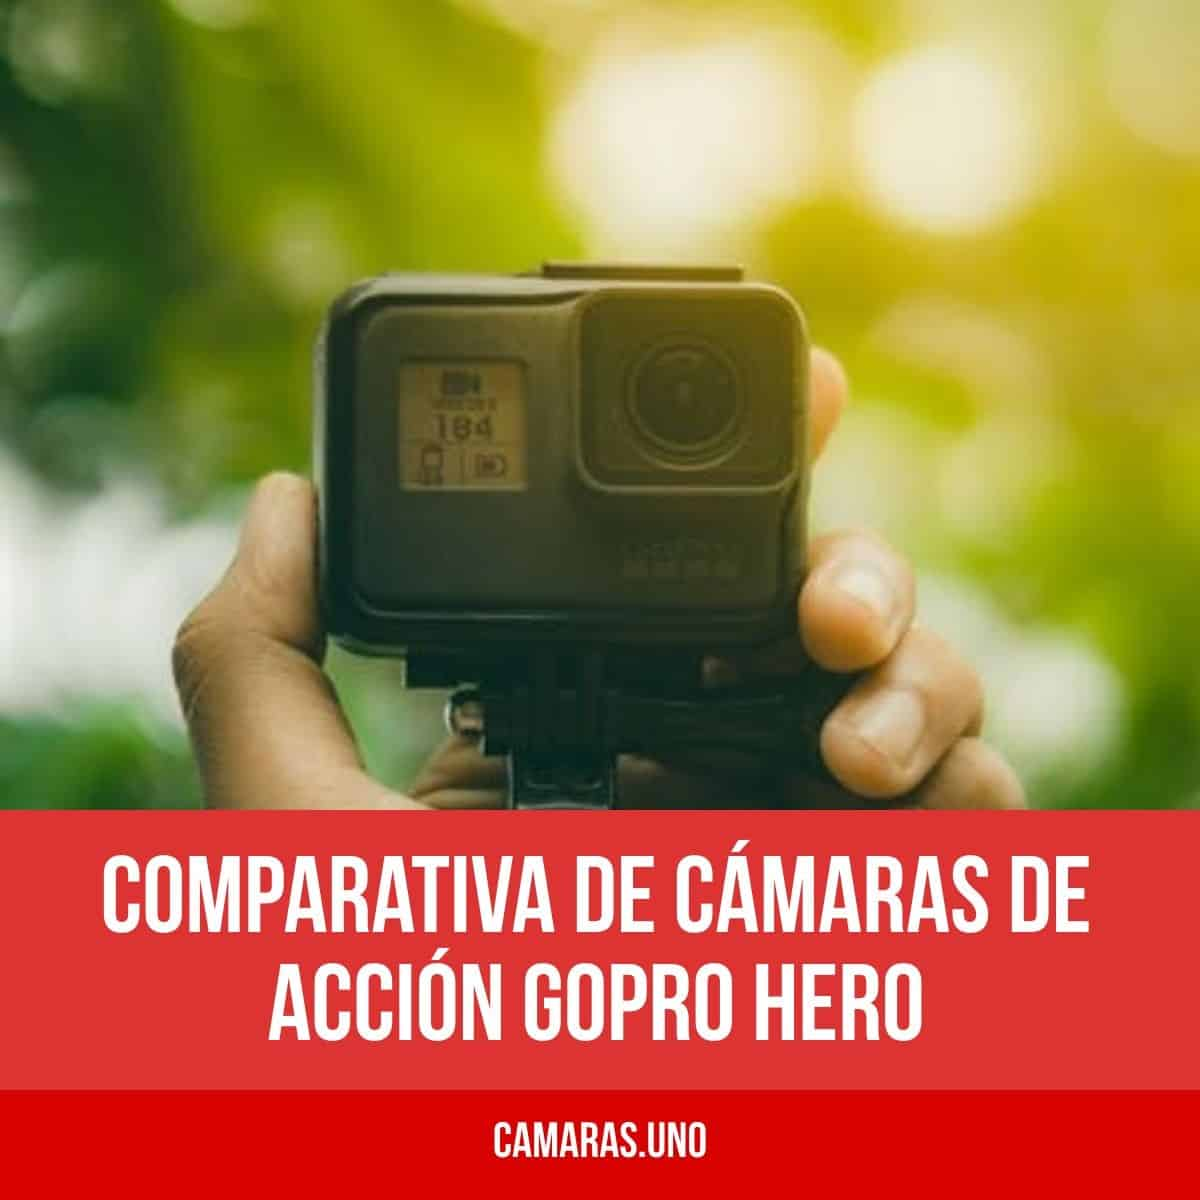 GoPro Hero 5 Black vs GoPro Hero 5 Session vs HERO6 vs HERO7 vs HERO8: comparativa de cámaras de acción